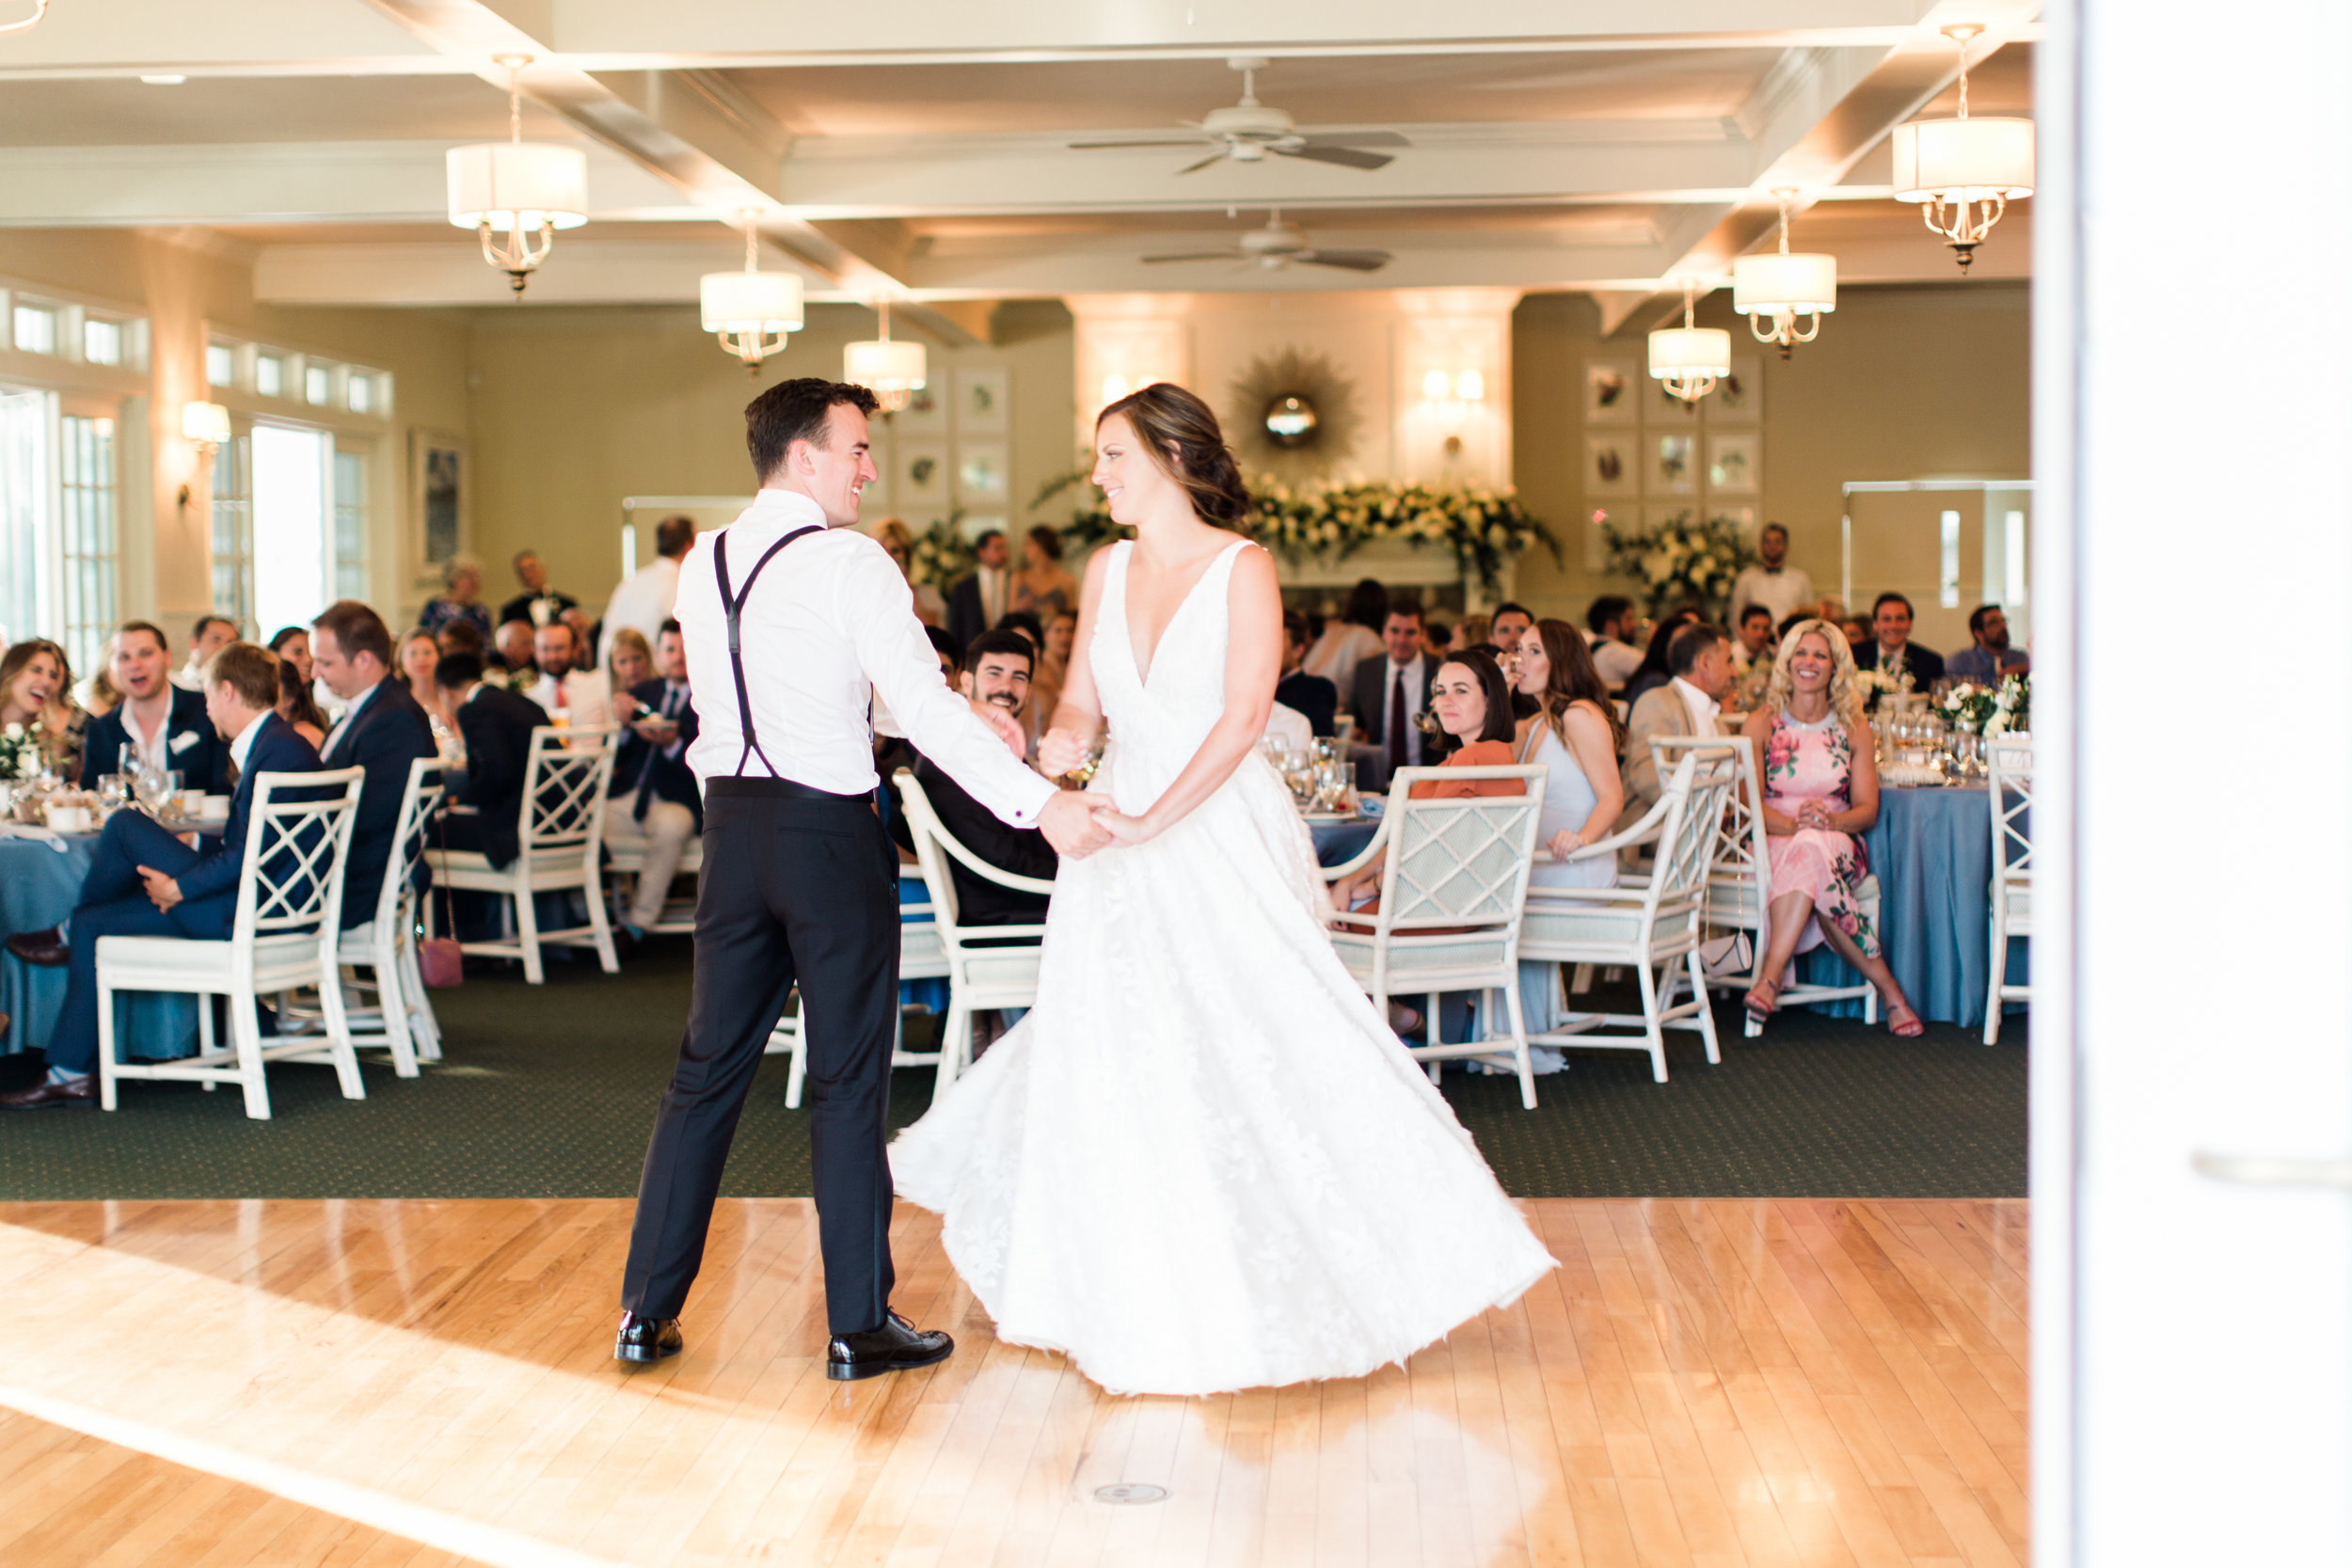 DeGuilio+Wedding+Reception-143.jpg